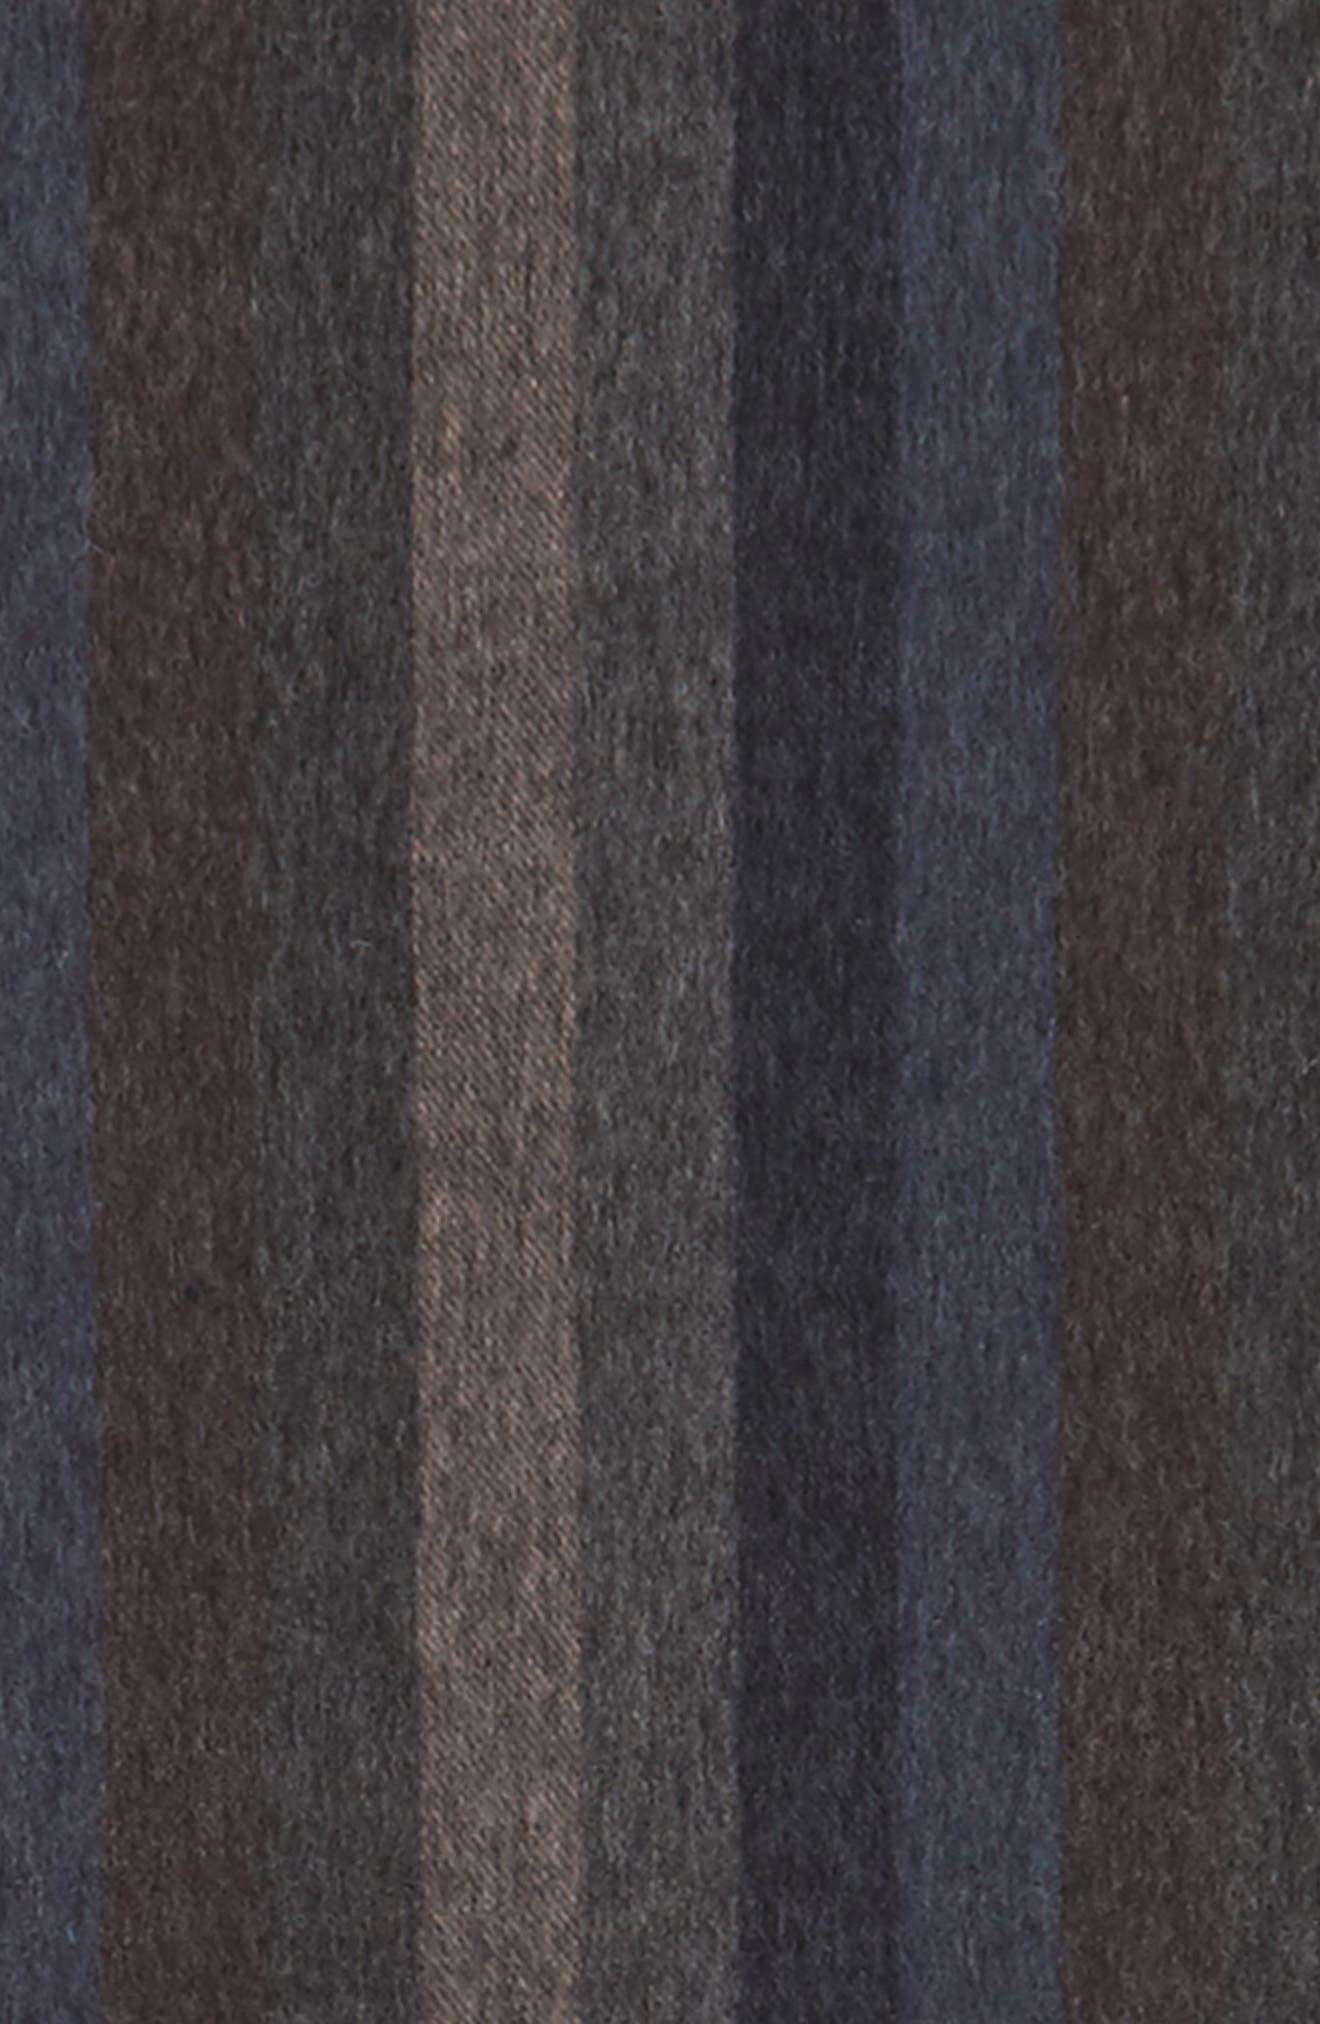 Lambswool Stripe Scarf,                             Alternate thumbnail 3, color,                             Brown - Navy Vertical Stripe